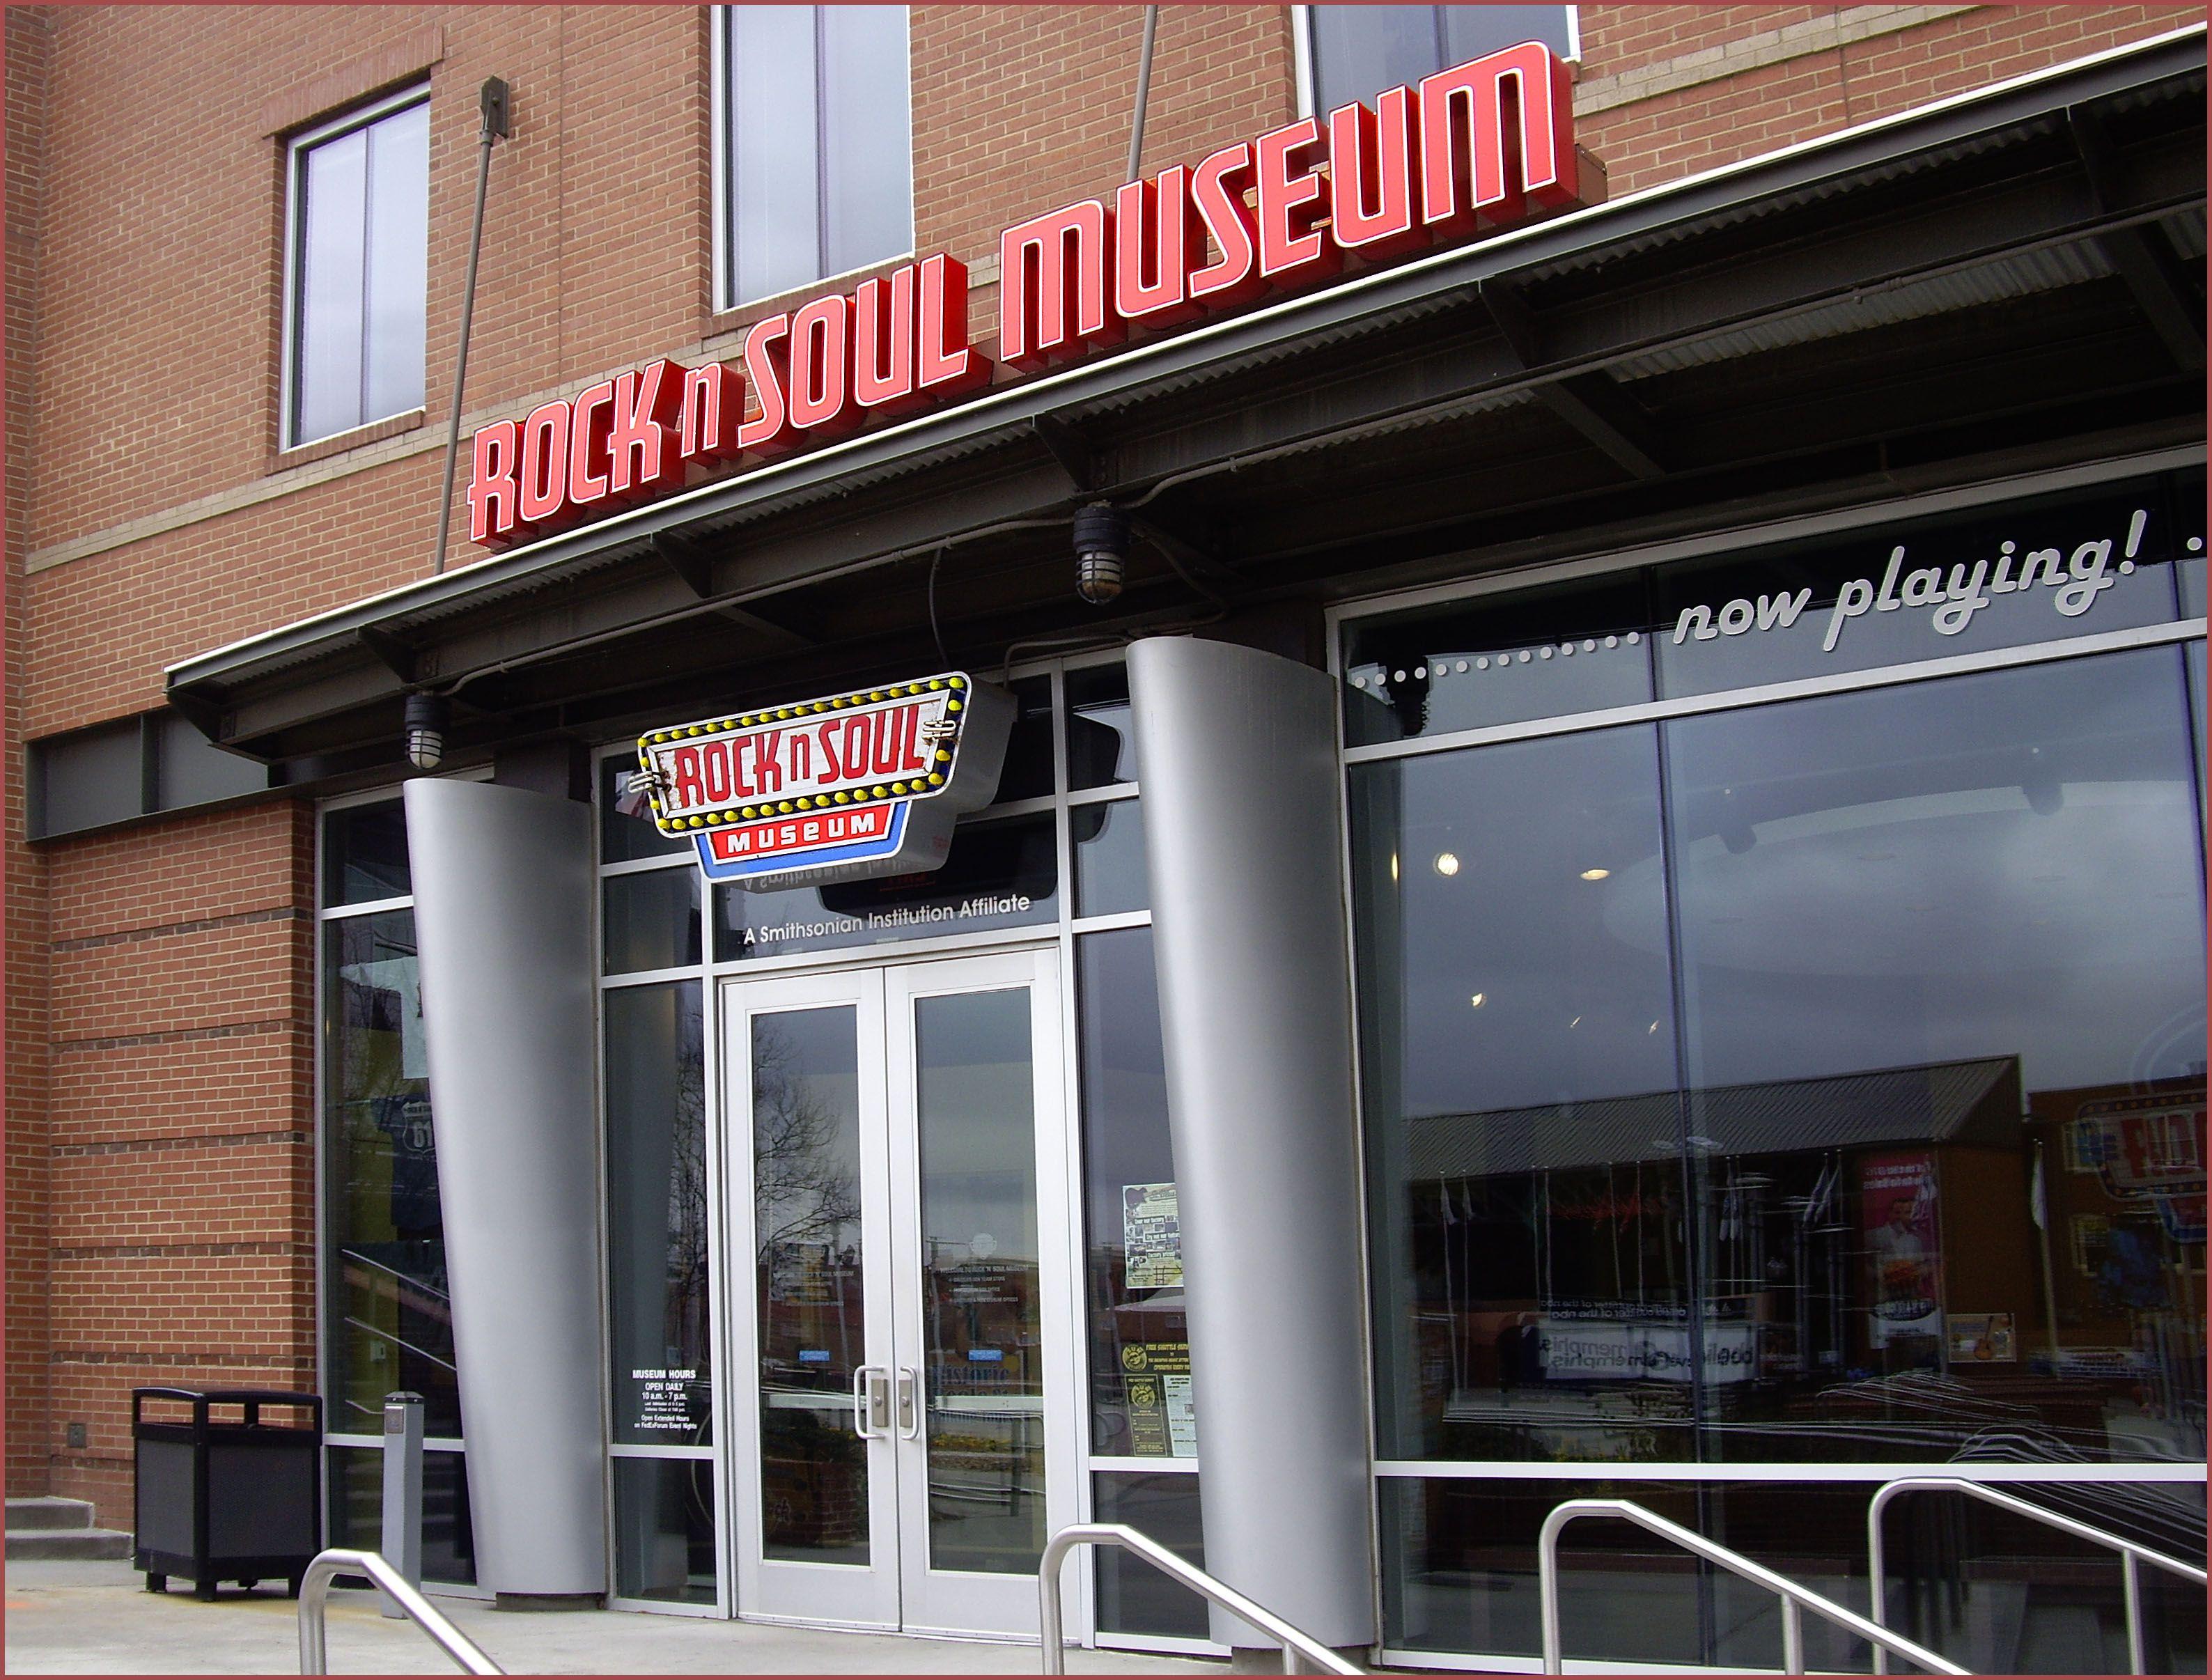 Entrance to Rock-n-soul Museum in Memphis